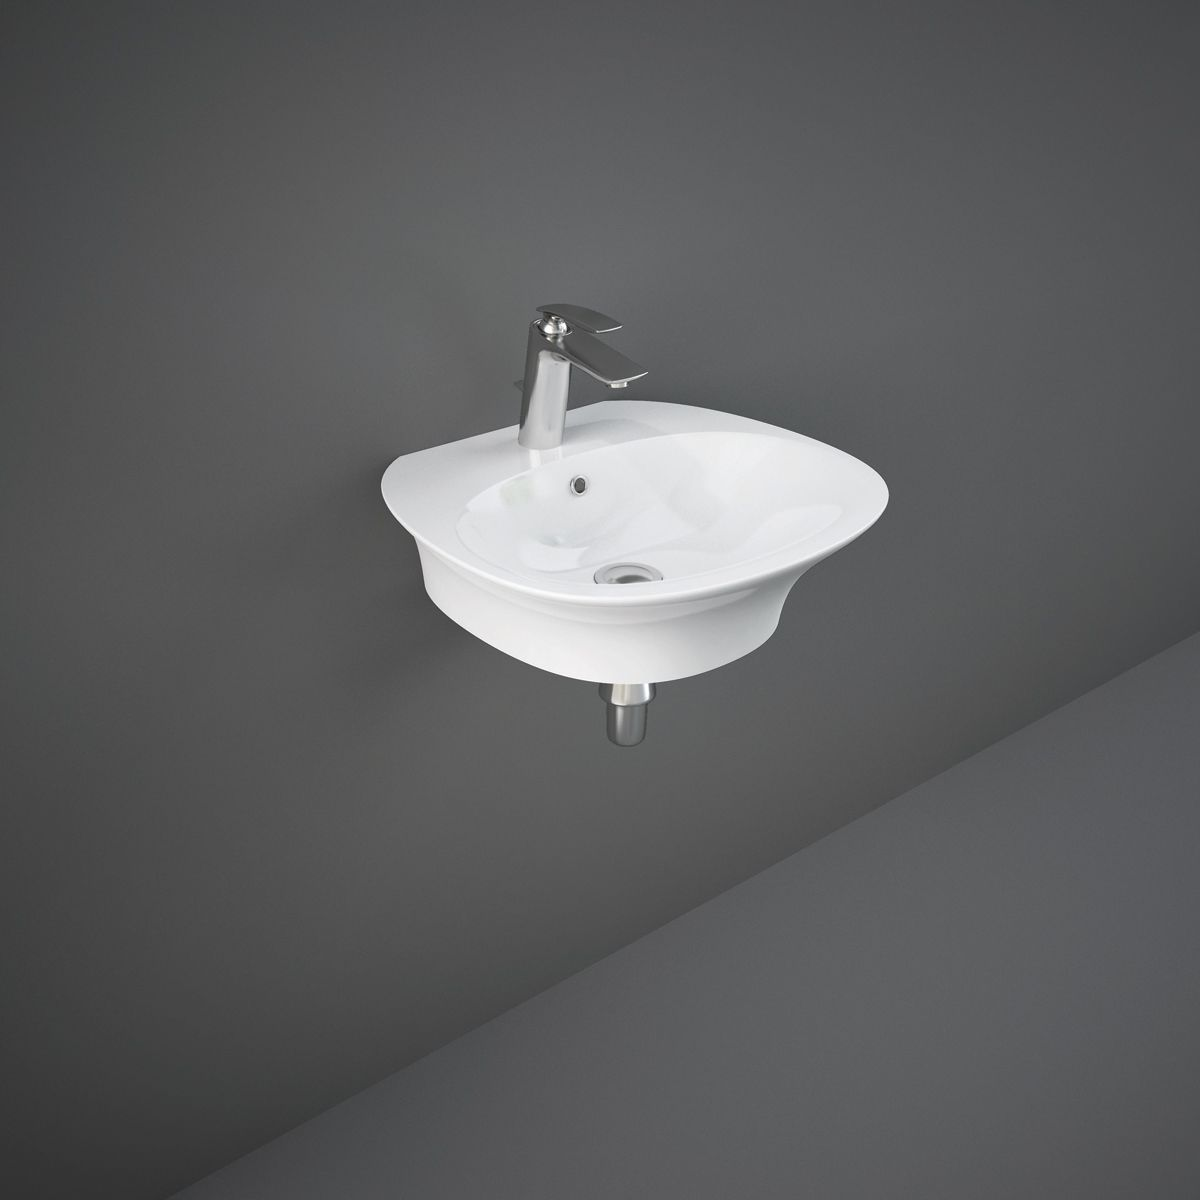 RAK Sensation Gloss White 1 Tap Hole Wall Hung Basin 550mm